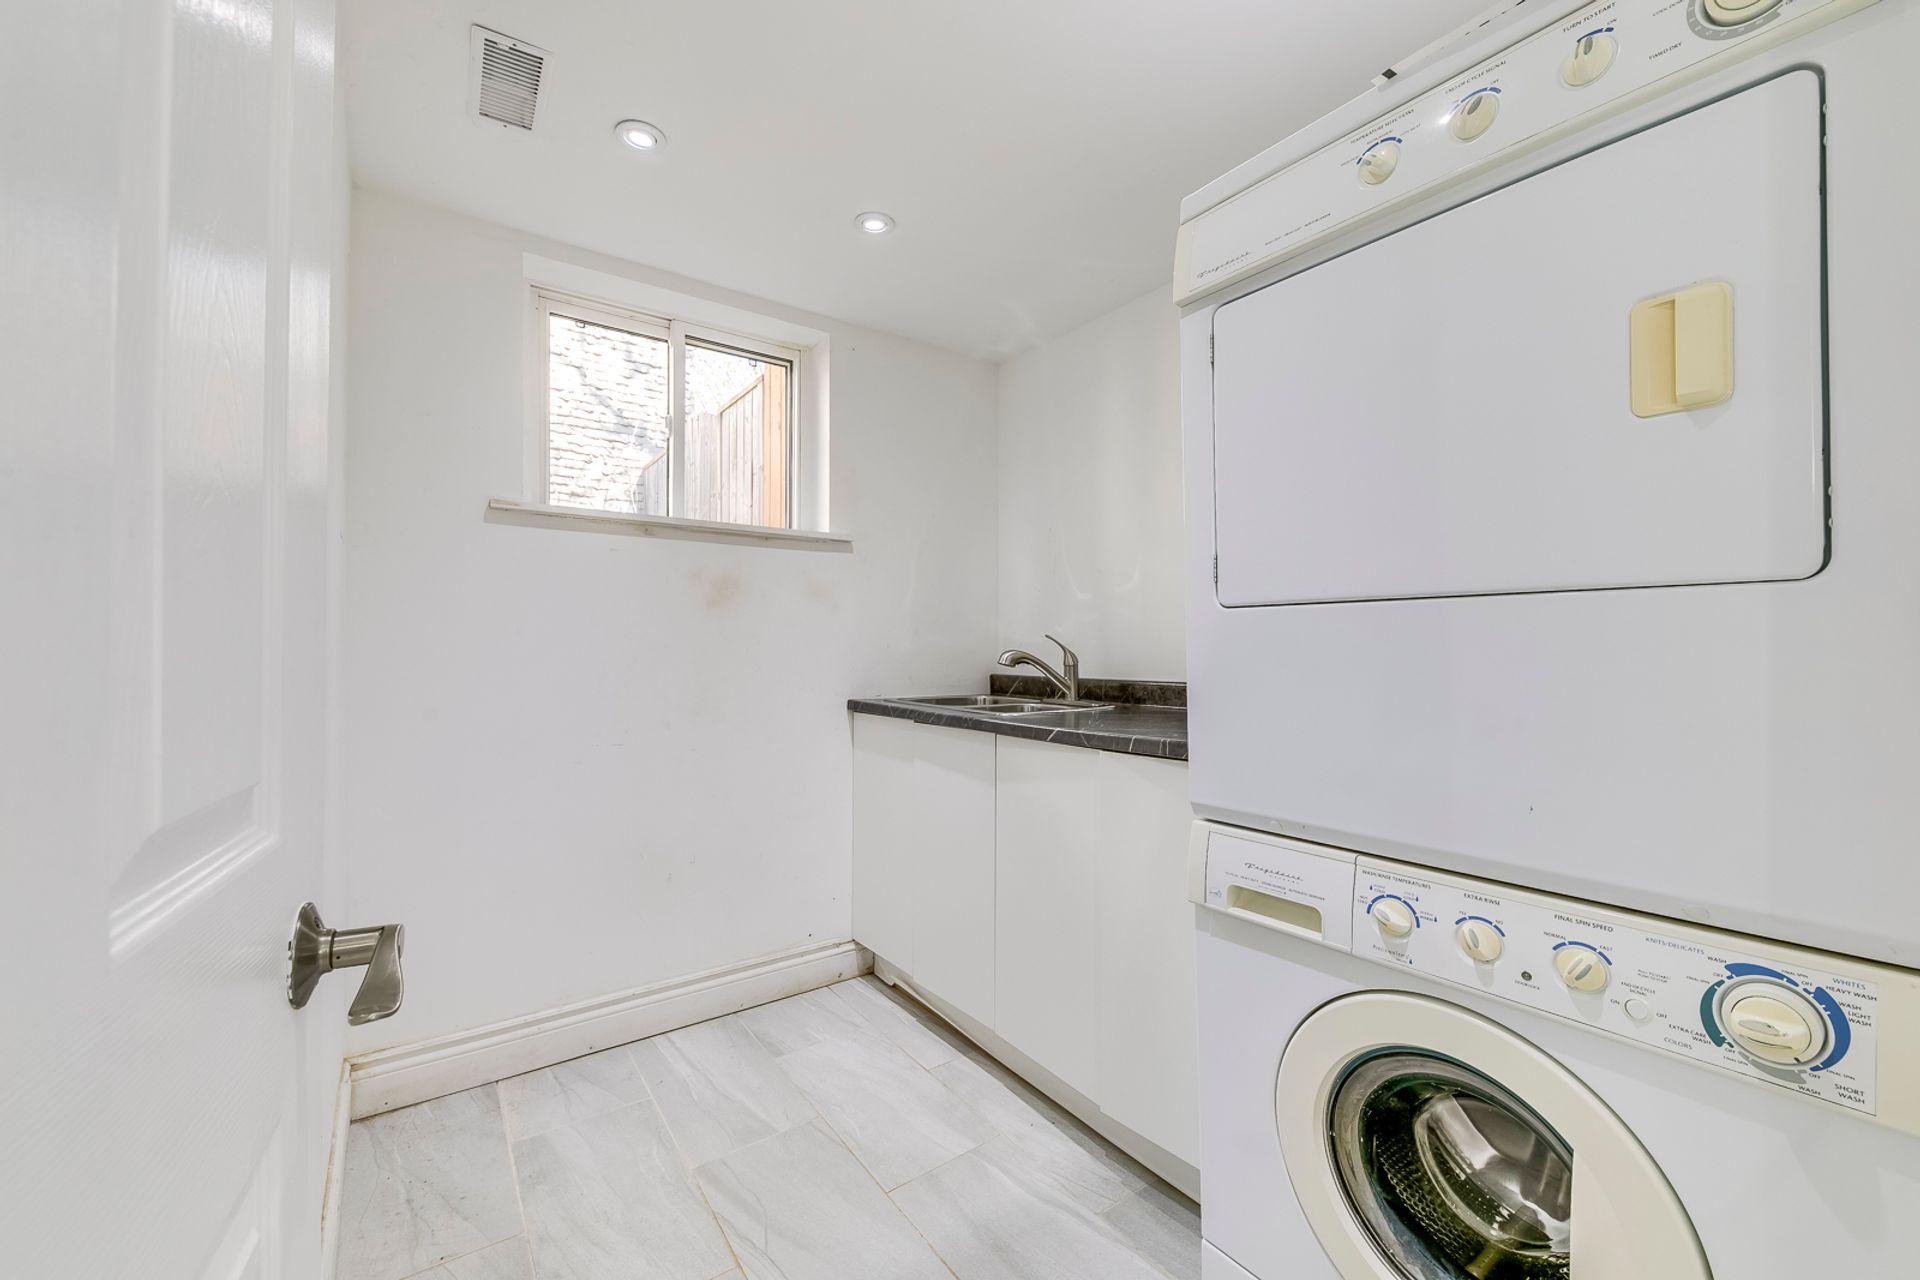 Lower Laundry Room -1247 Kensington Park Rd, Oakville - Elite3 & Team at 1247 Kensington Park Road, Iroquois Ridge South, Oakville